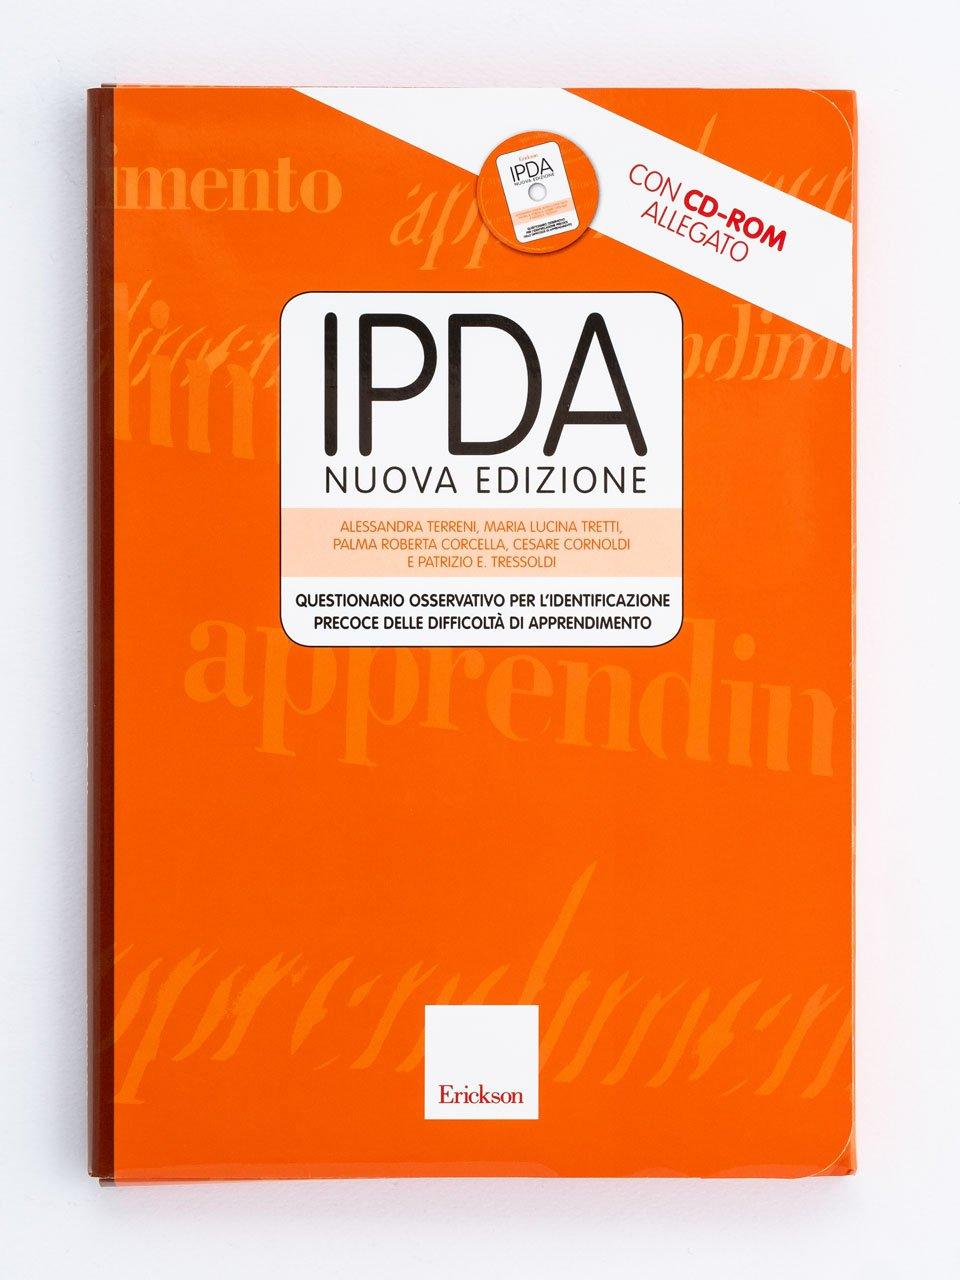 Test IPDA - Libri - Strumenti - Erickson 3